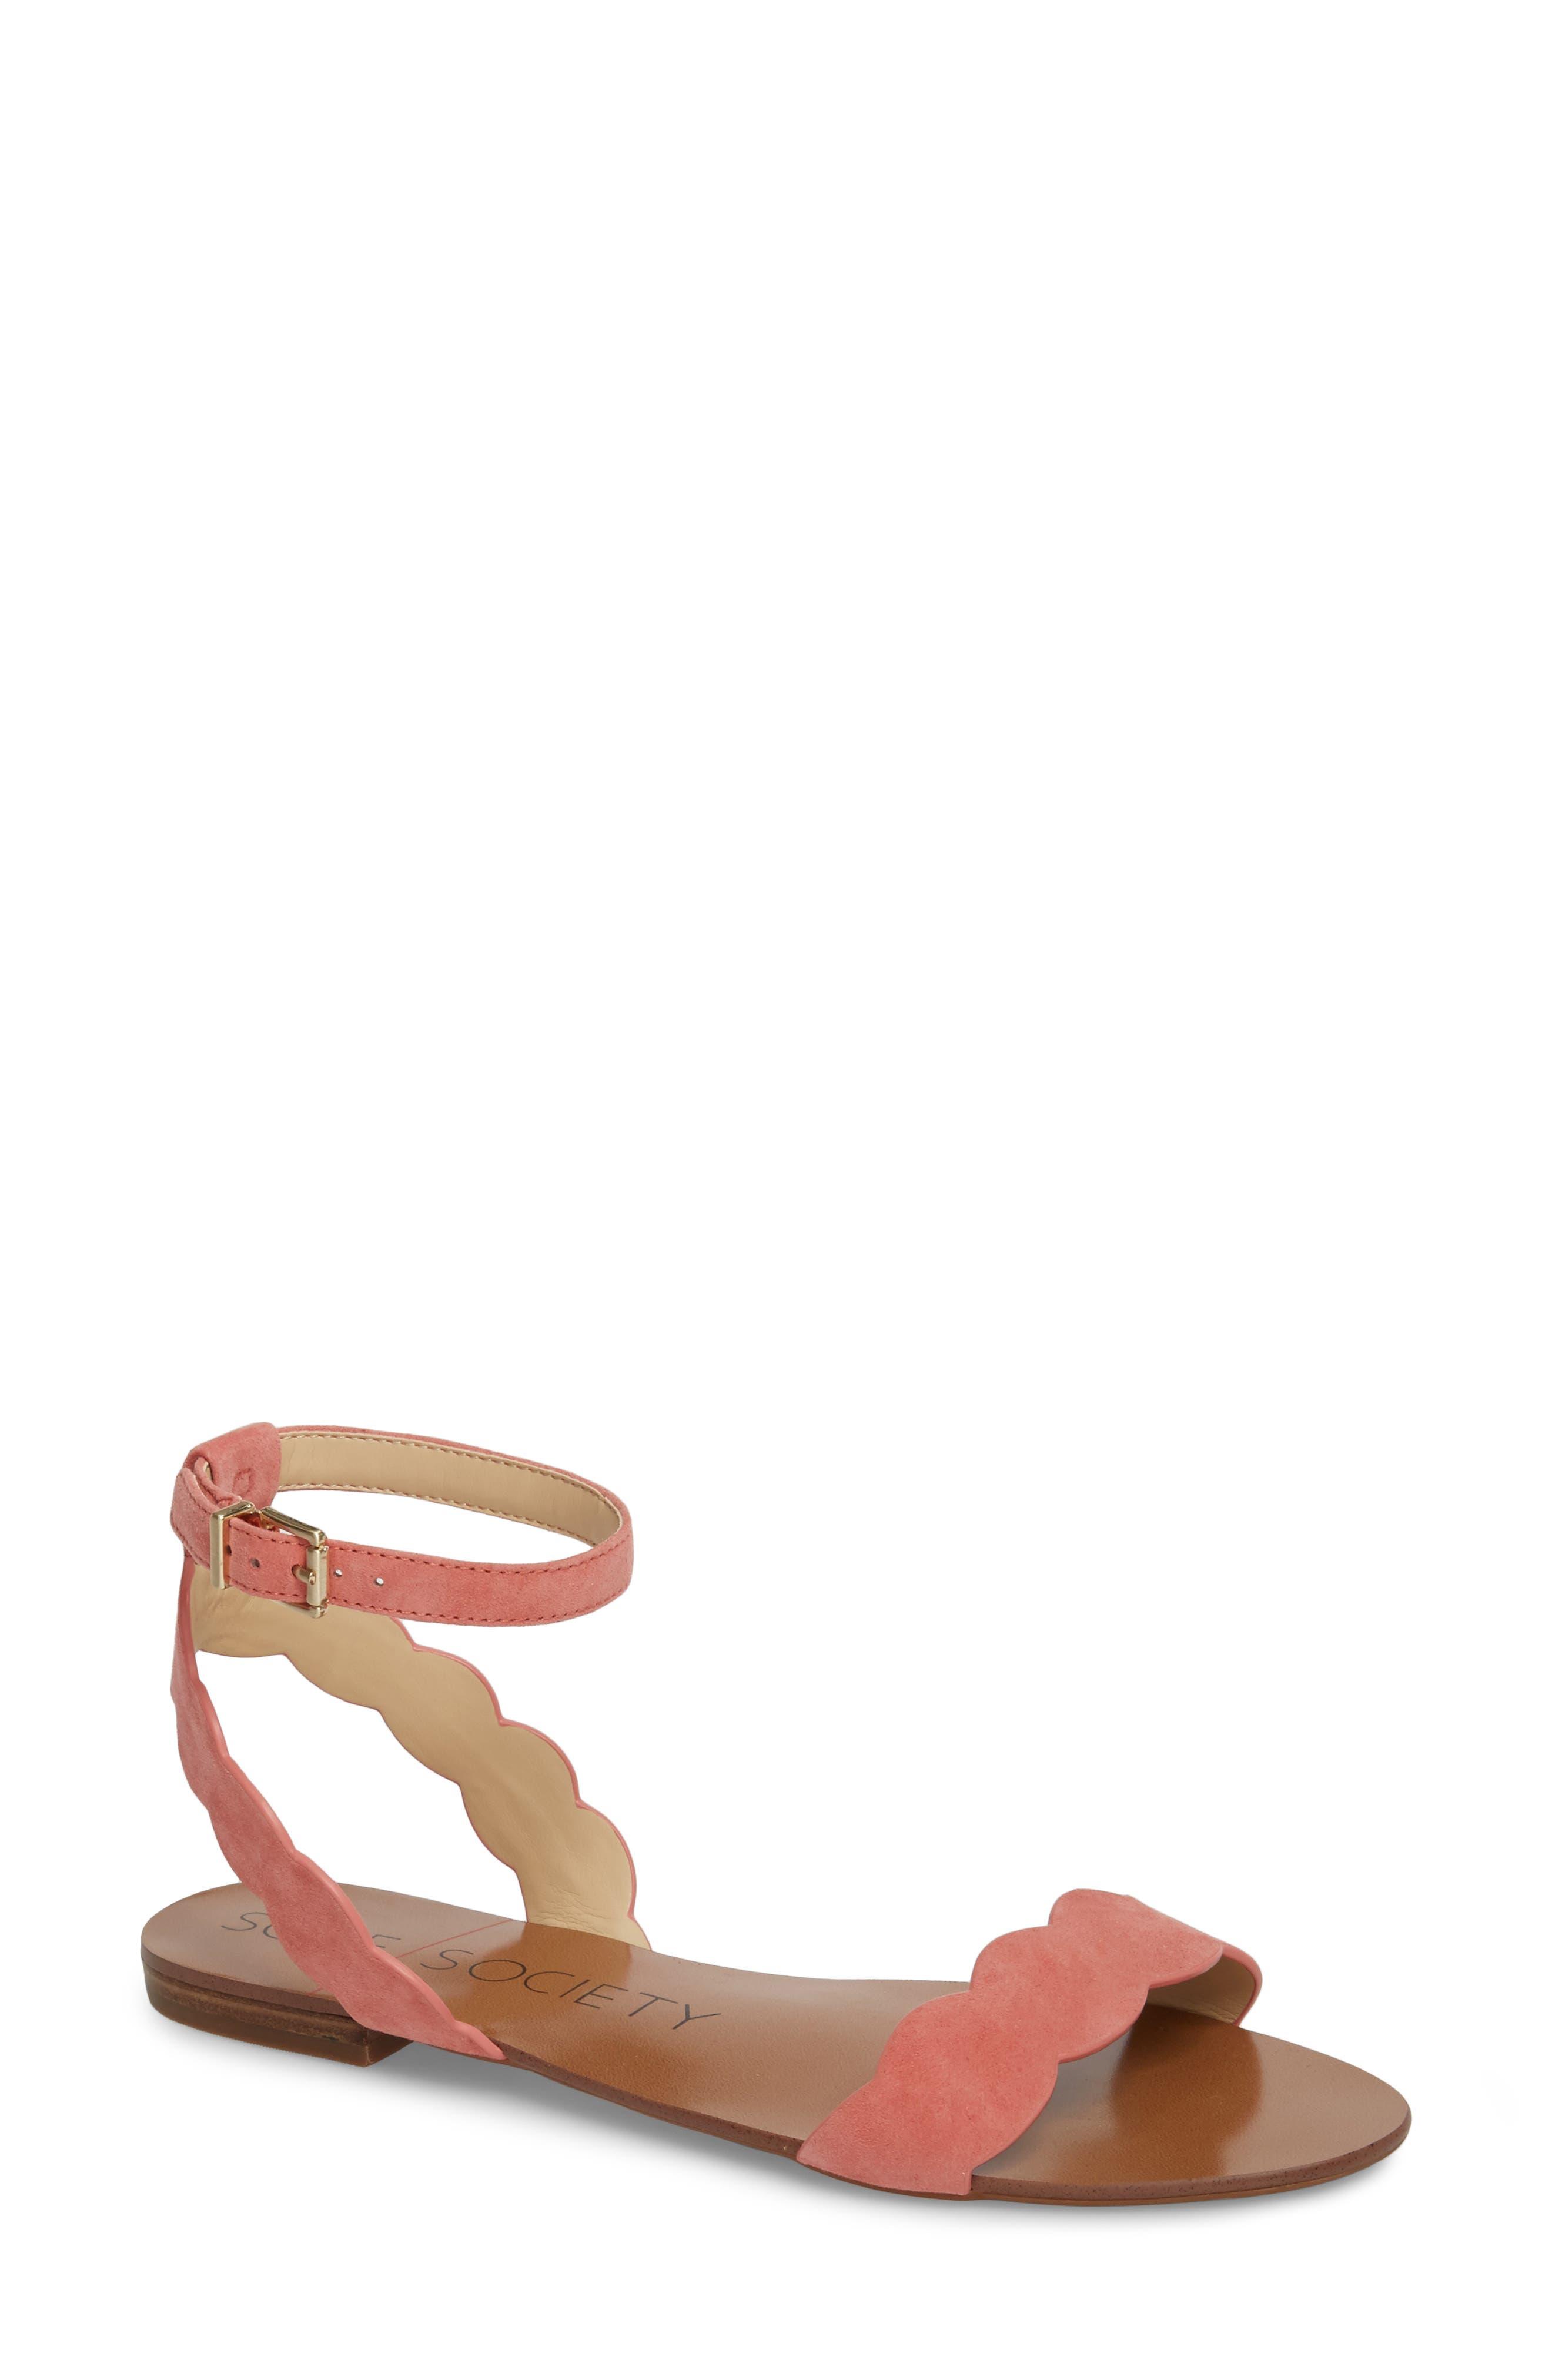 'Odette' Scalloped Ankle Strap Flat Sandal,                             Main thumbnail 2, color,